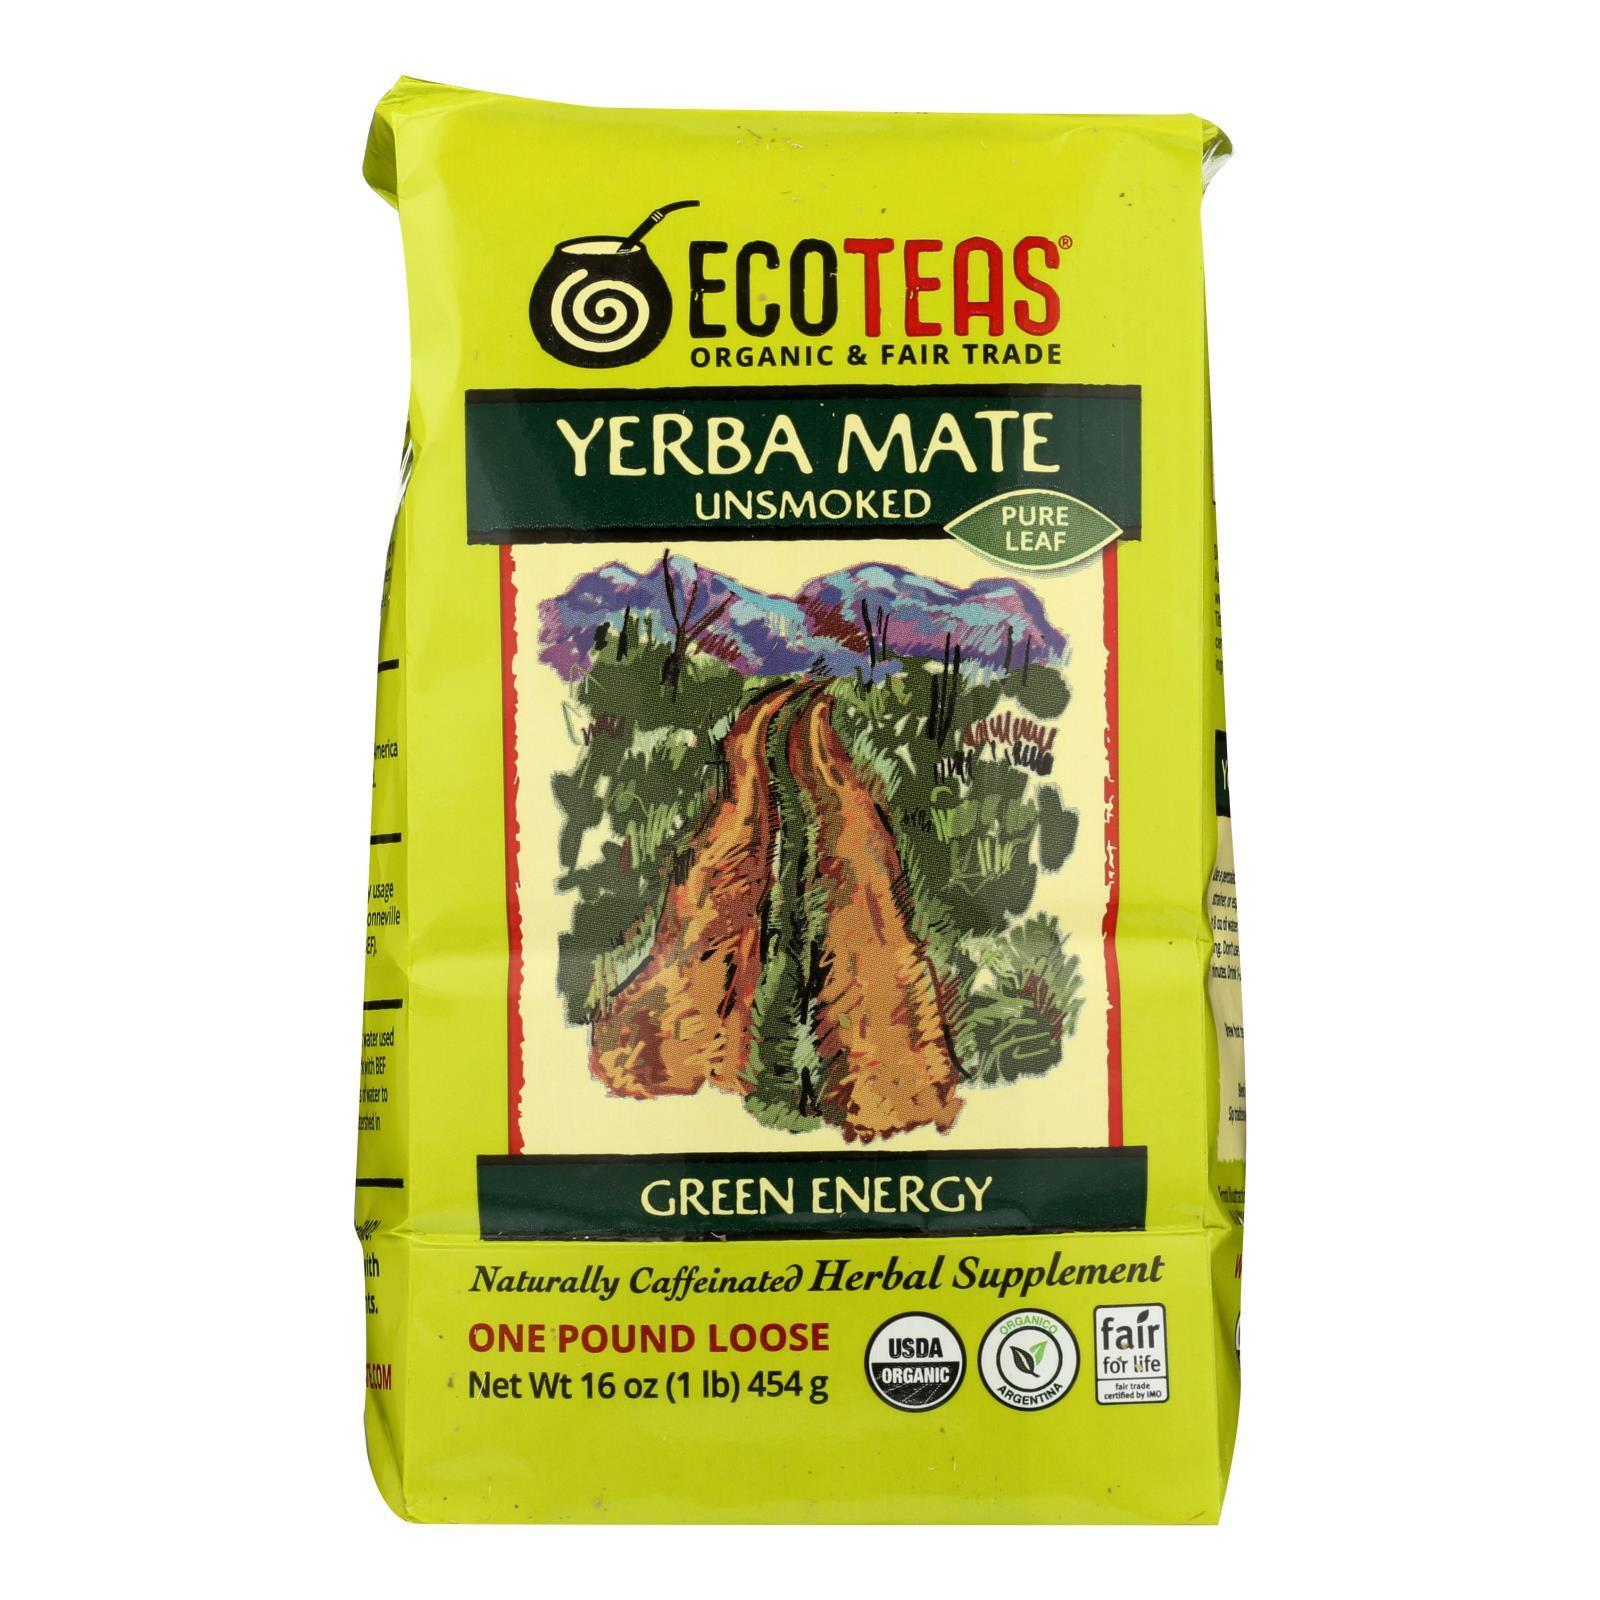 Ecoteas Organic Yerba Mate Unsmoked Green Energy Loose Tea - Case of 6 - 1 lb.